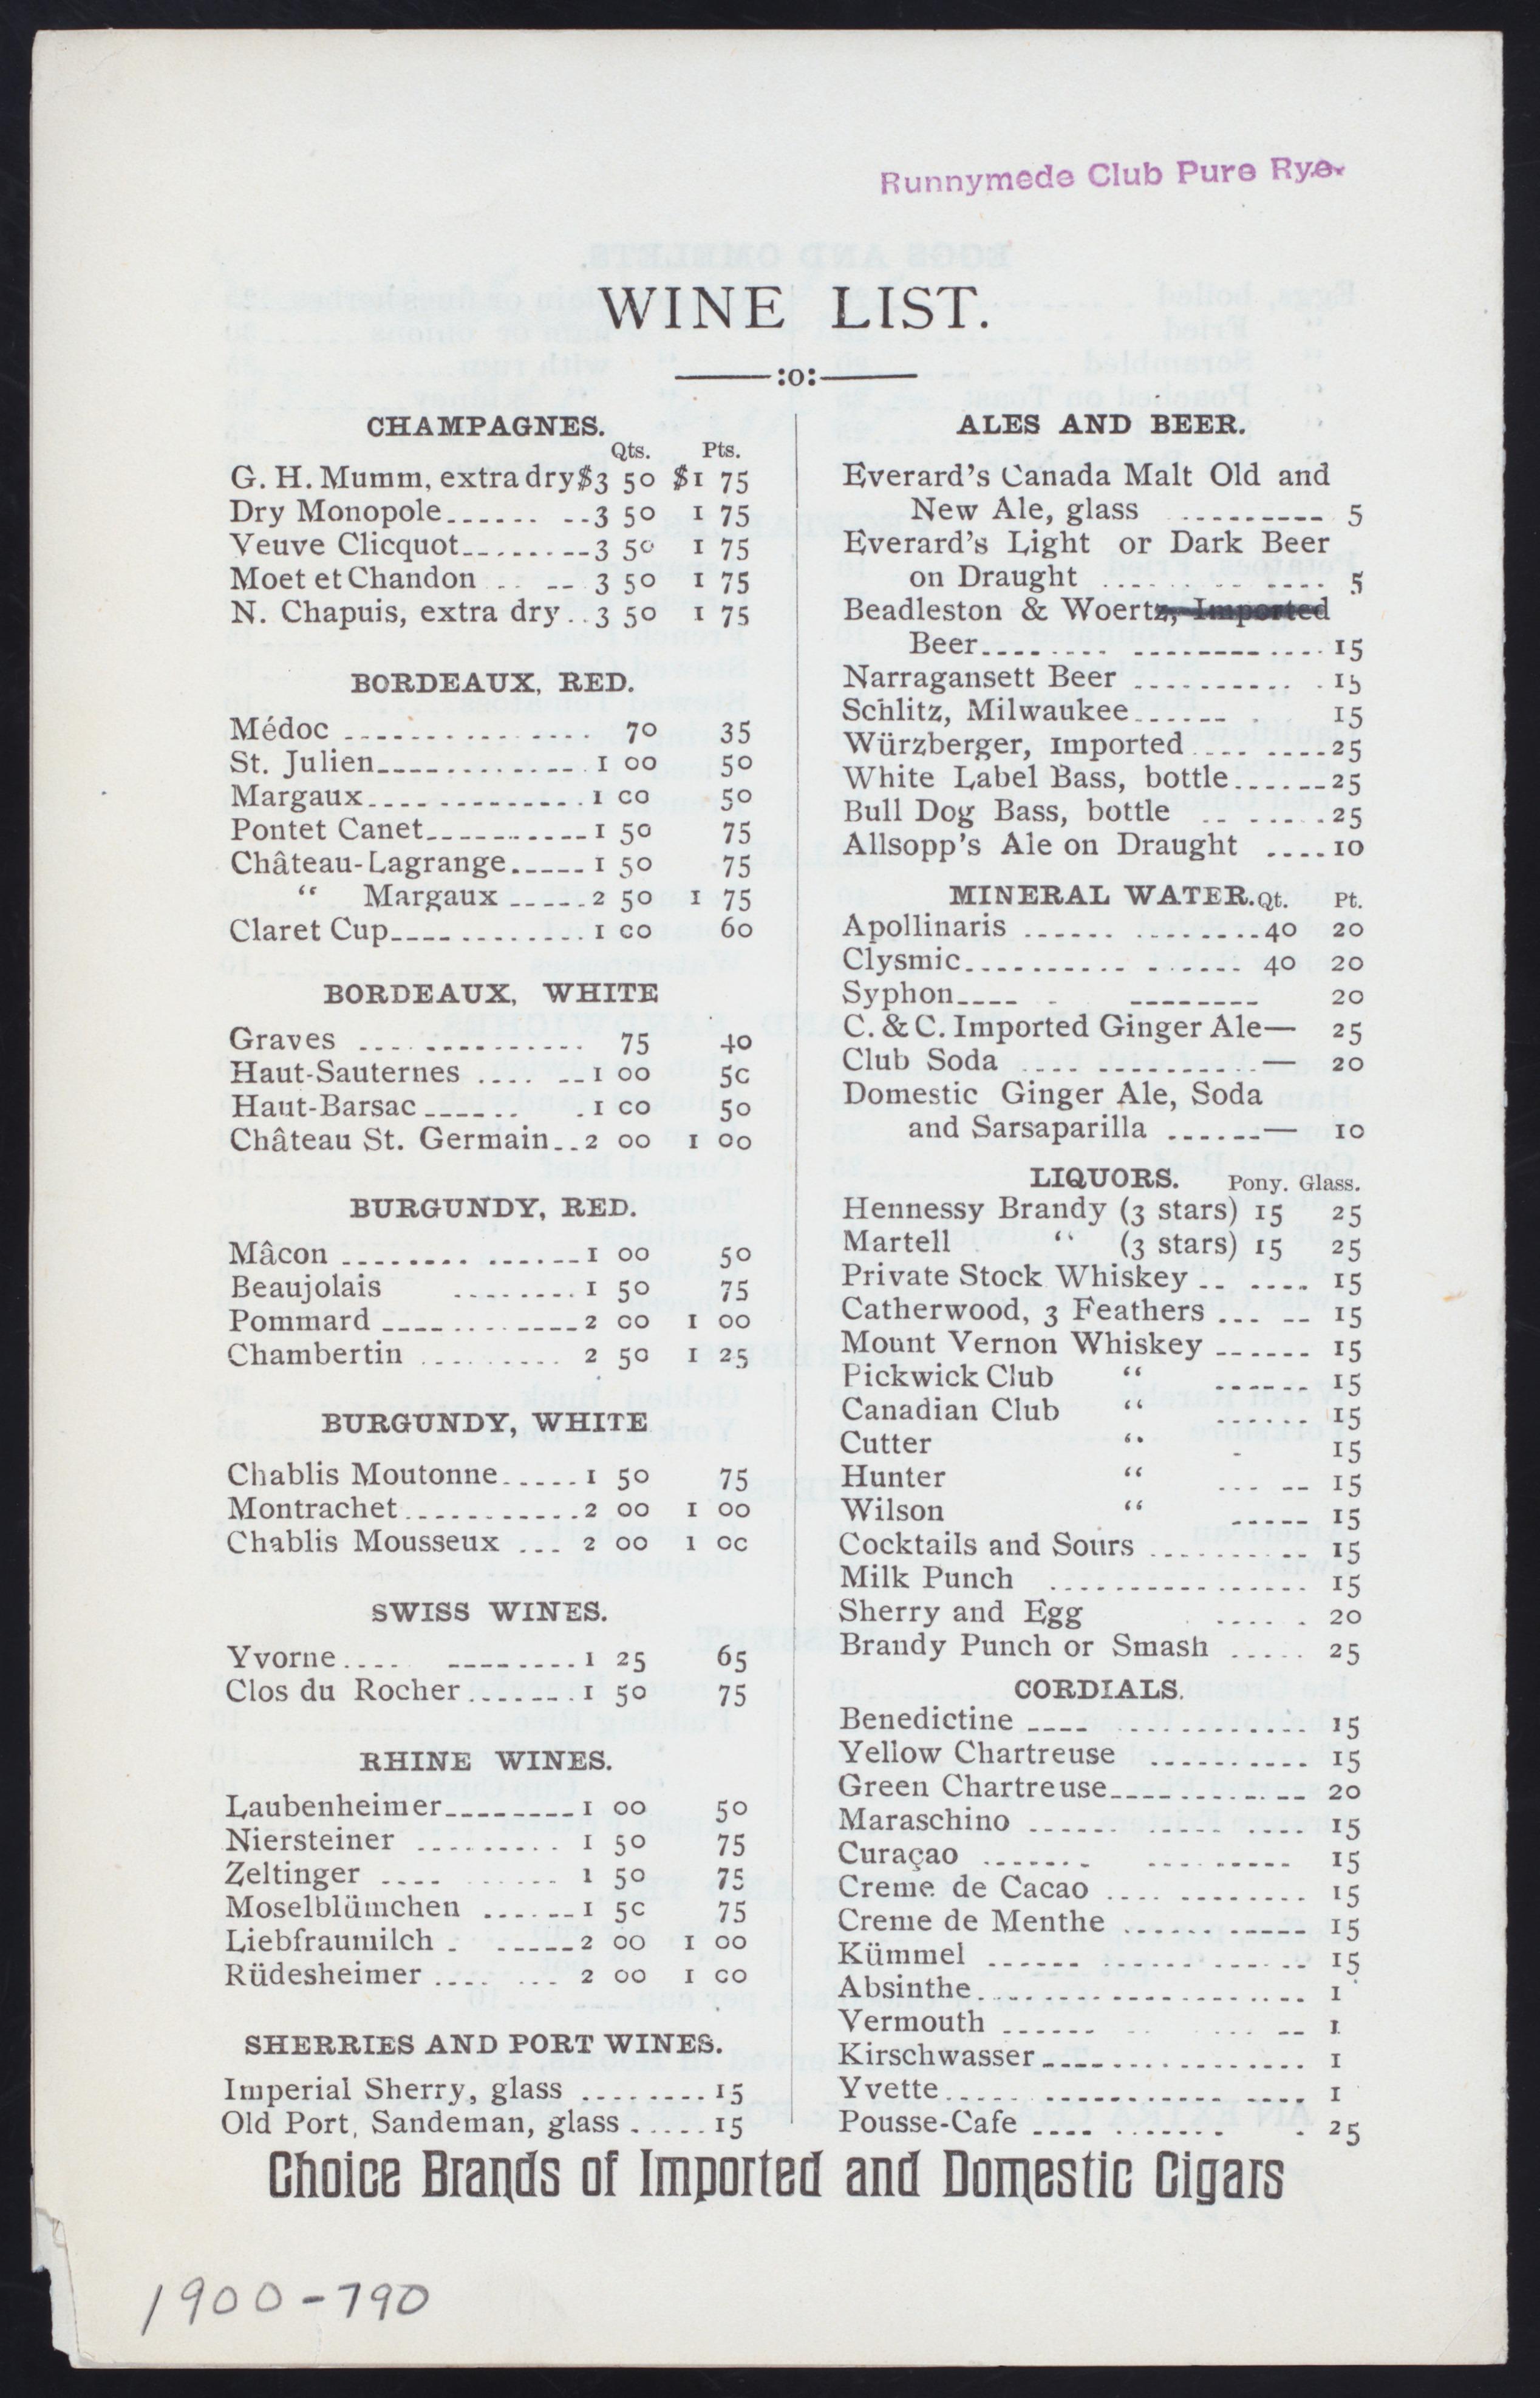 File:DAILY MENU (held by) KNICKERBOCKER HOTEL RESTAURANT (at